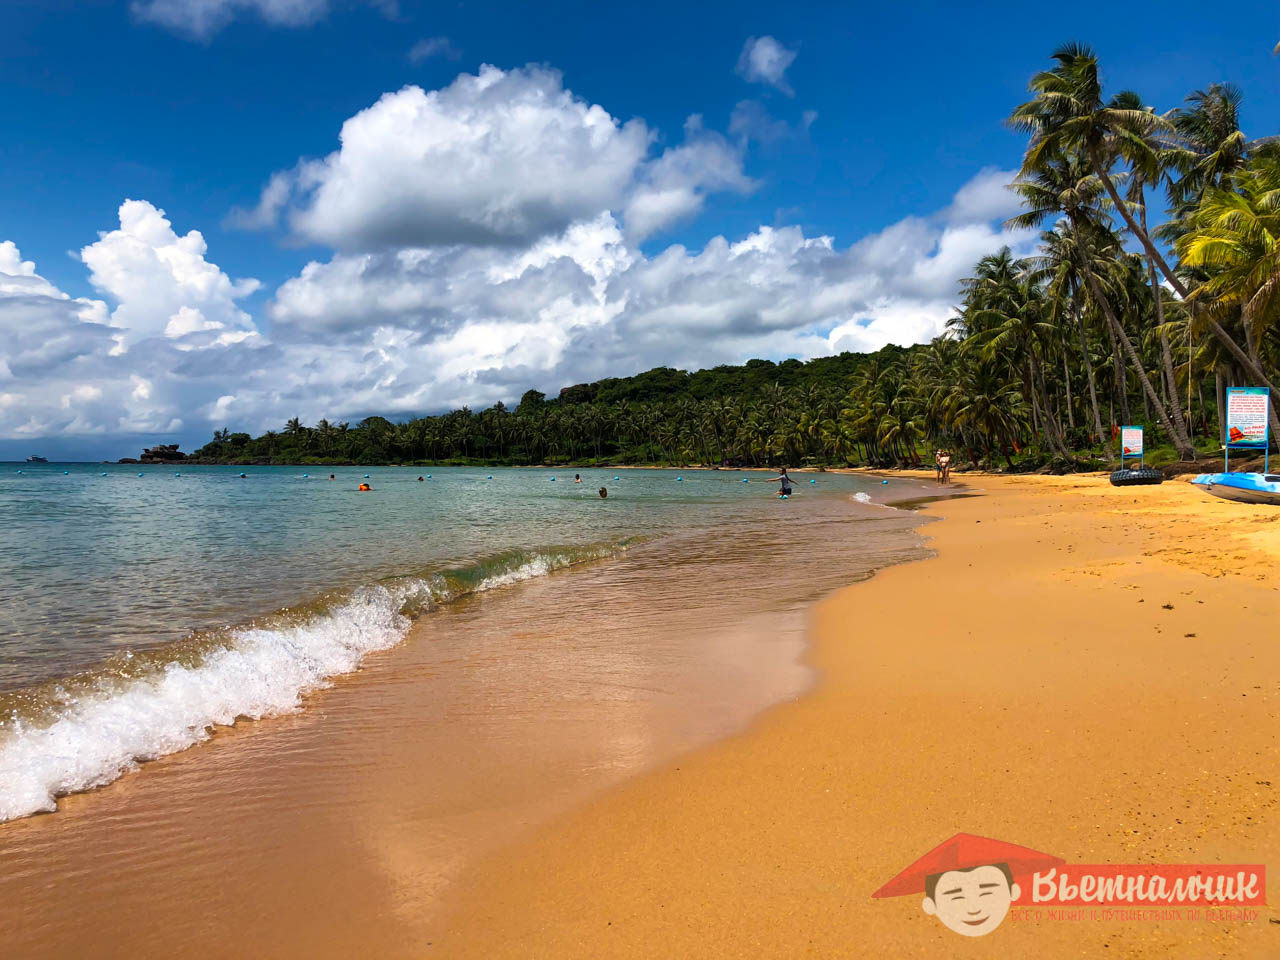 Beach on Thom Island (Phu Quoc, Vietnam)